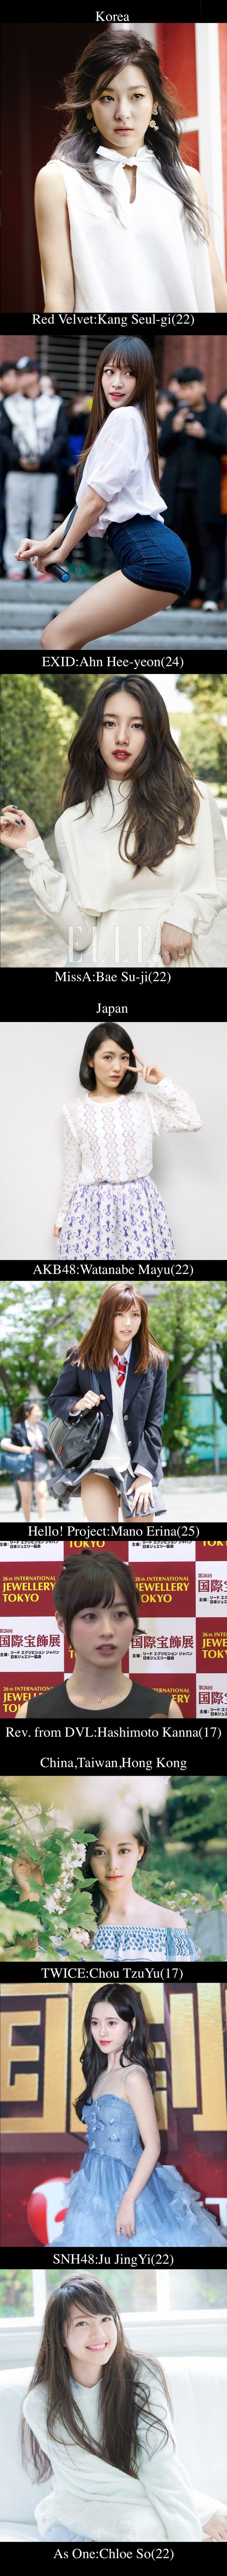 Asian idols (Korea, Japan, China, Taiwan, Hong Kong) Which is your favorite?